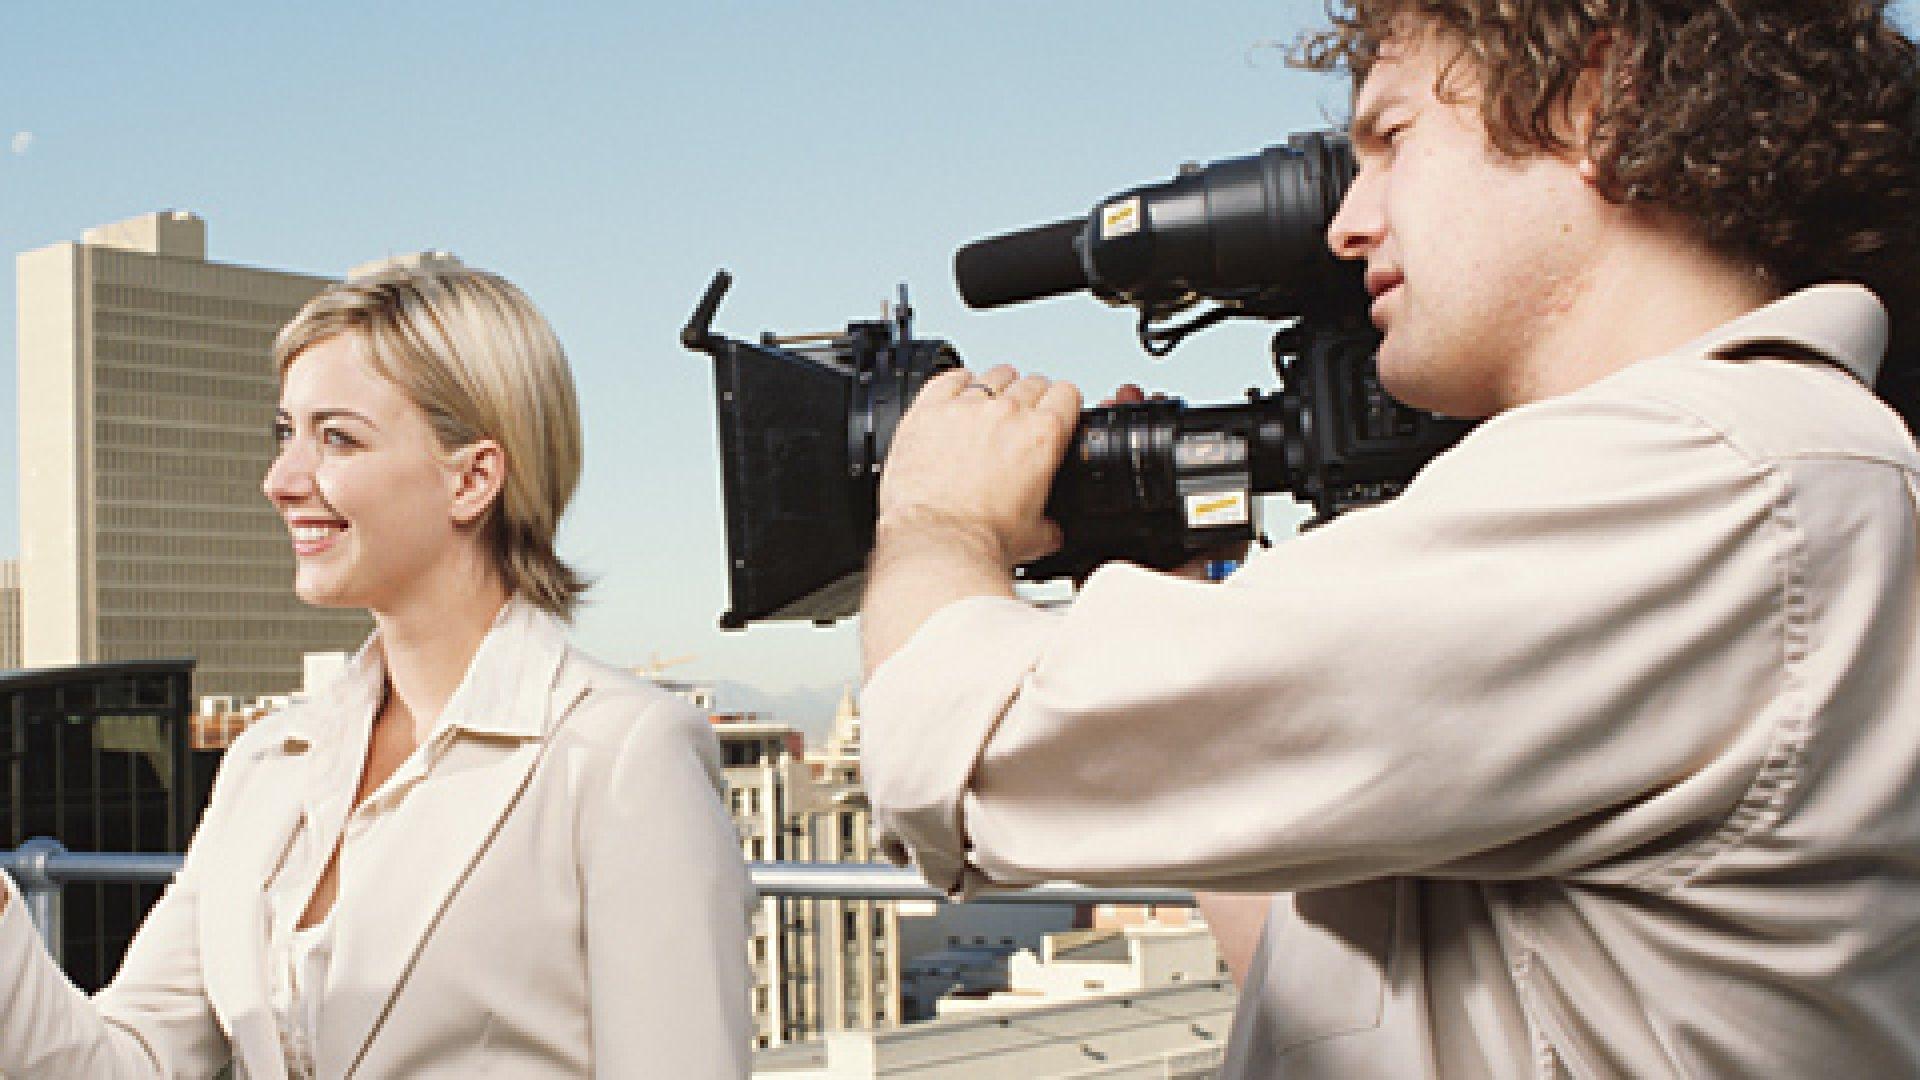 5 Easy Ways to Drum Up PR Coverage